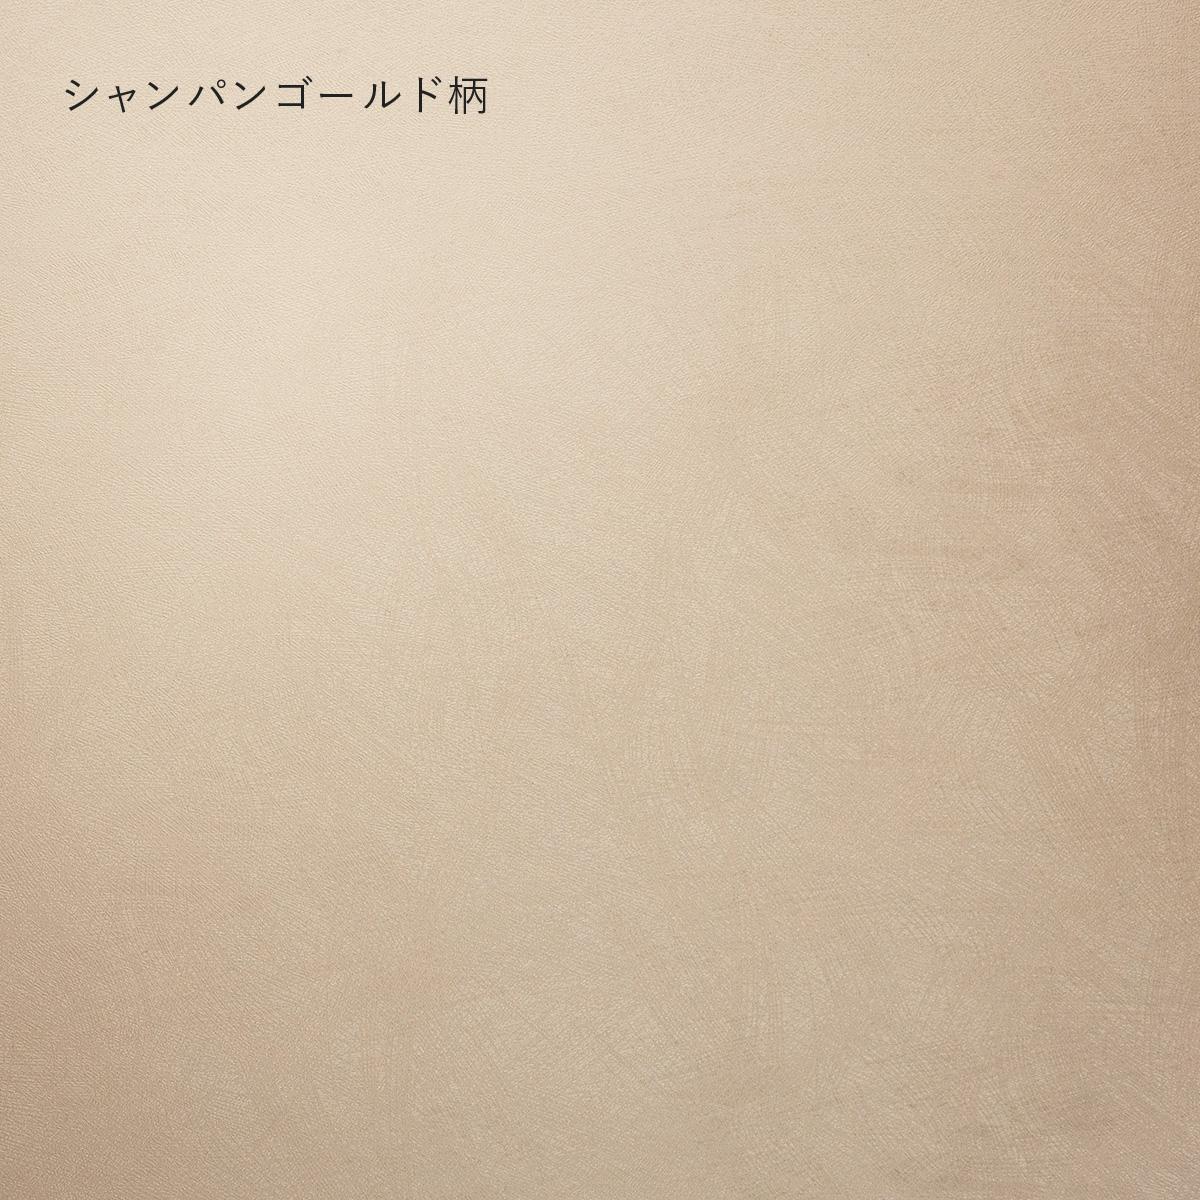 【 V-TISS LIGHT #009 】 遊び心ある浅めの飾り棚 3個セット